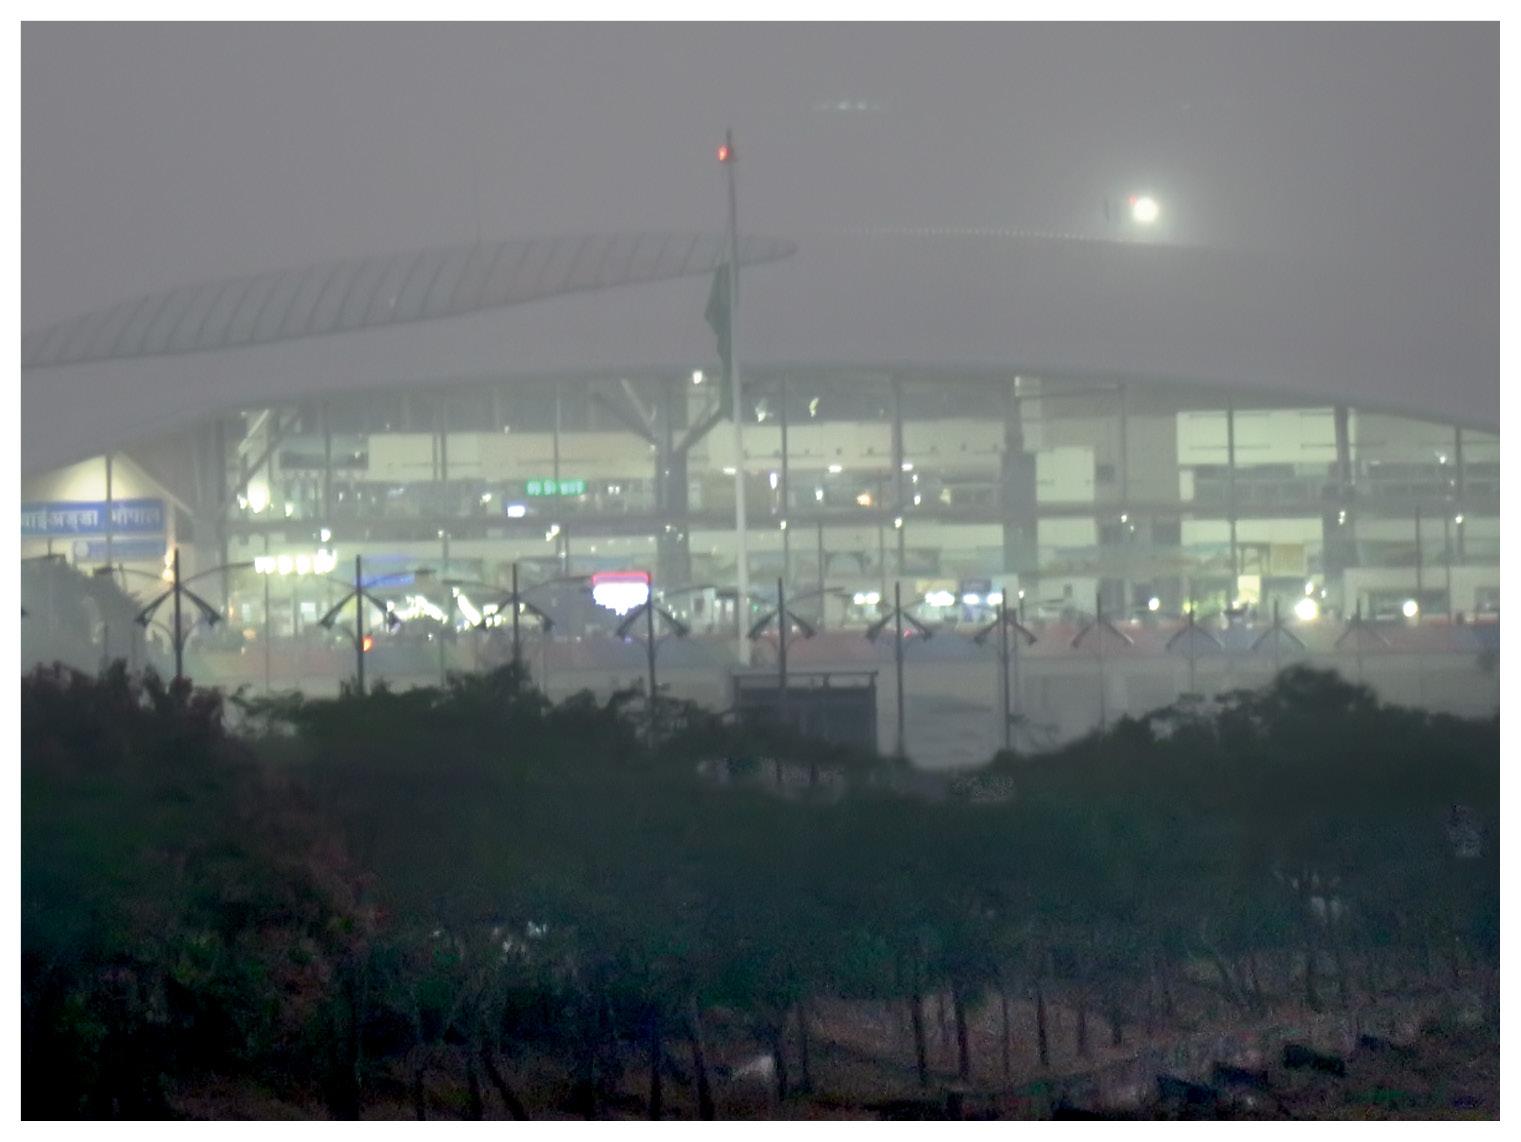 भोपाल का राजाभोज एयरपोर्ट, यहां कोहरे के कारण विजिबिलिटी काफी कम हो गई।